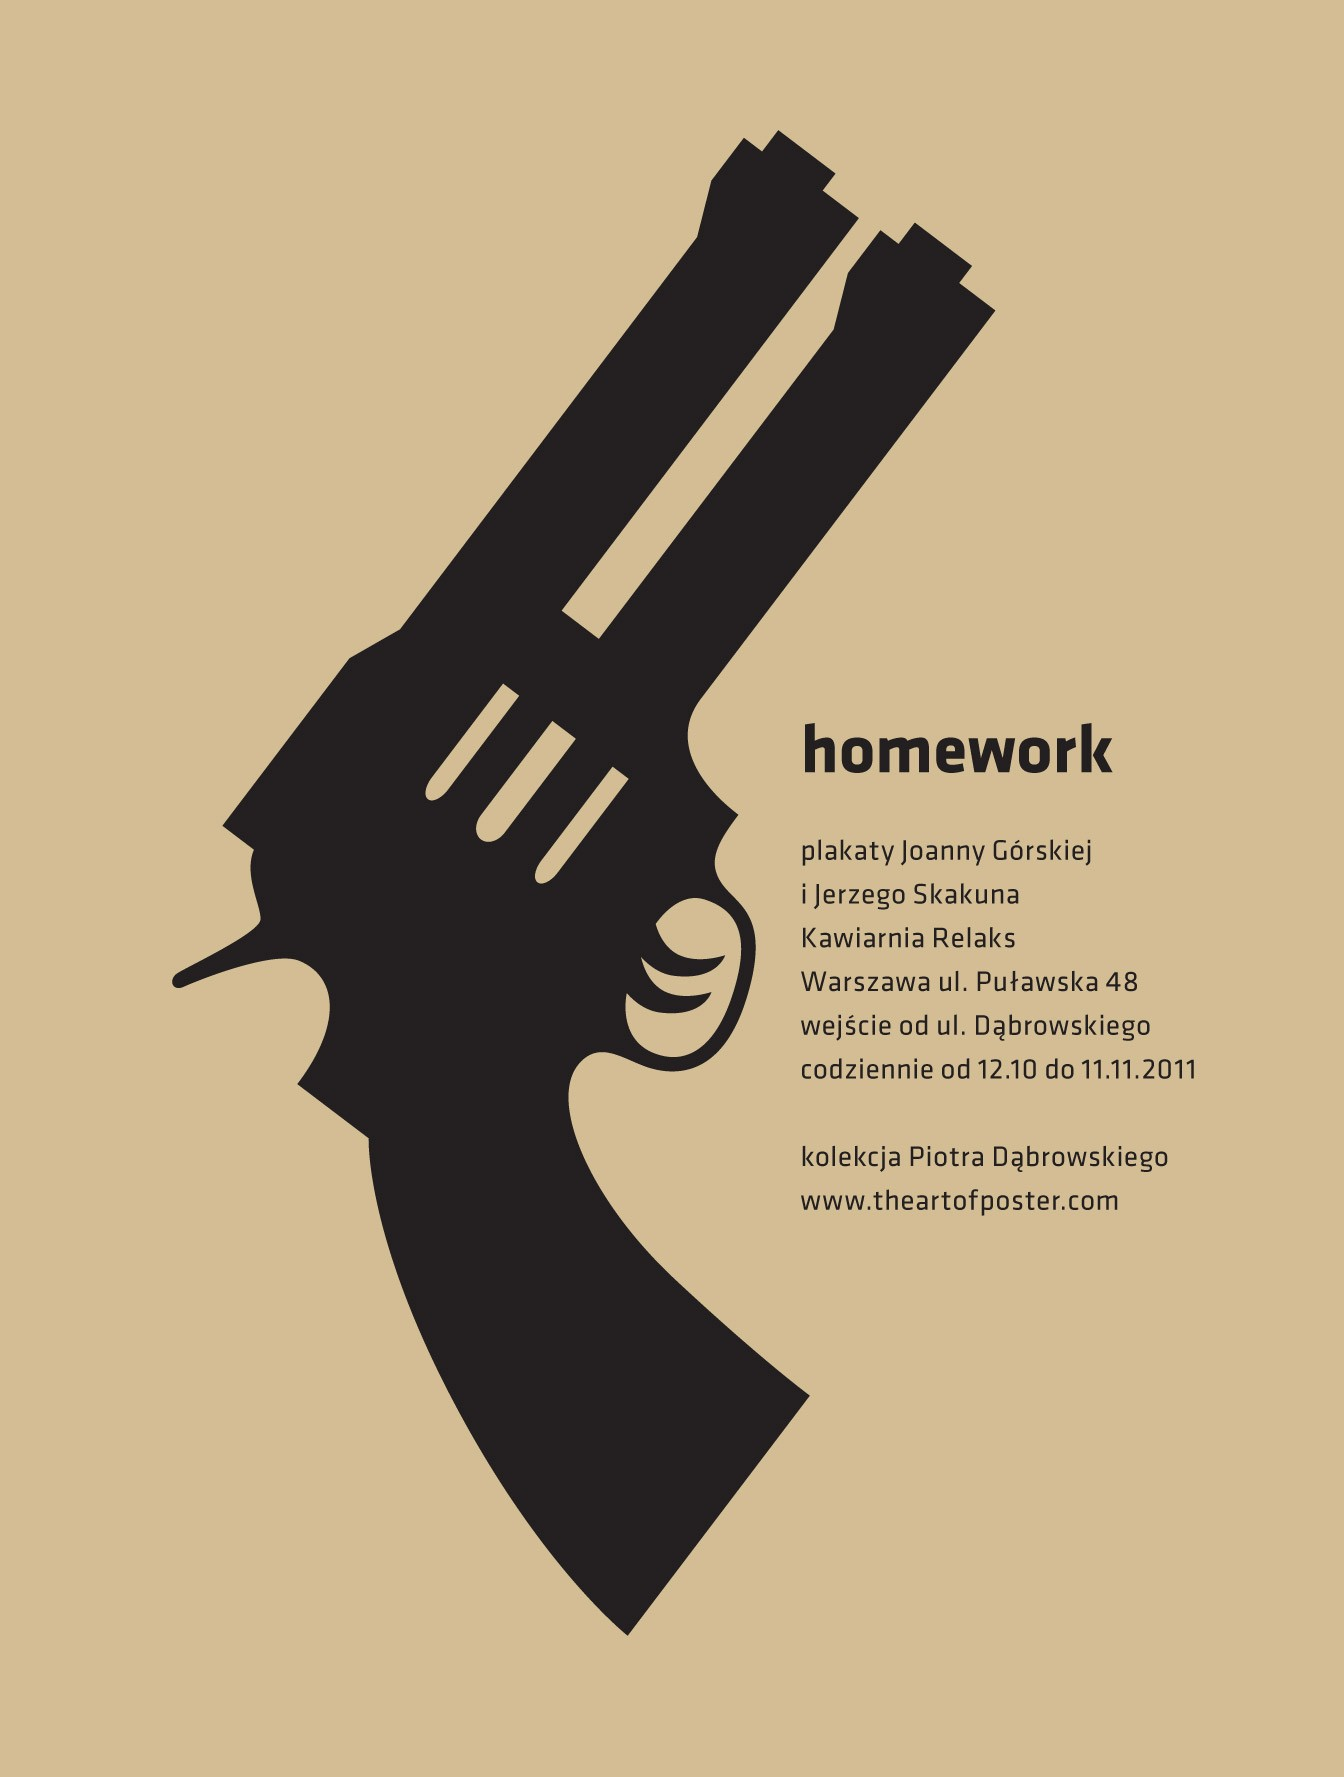 Homework Joanna Gorska Jerzy Skakun